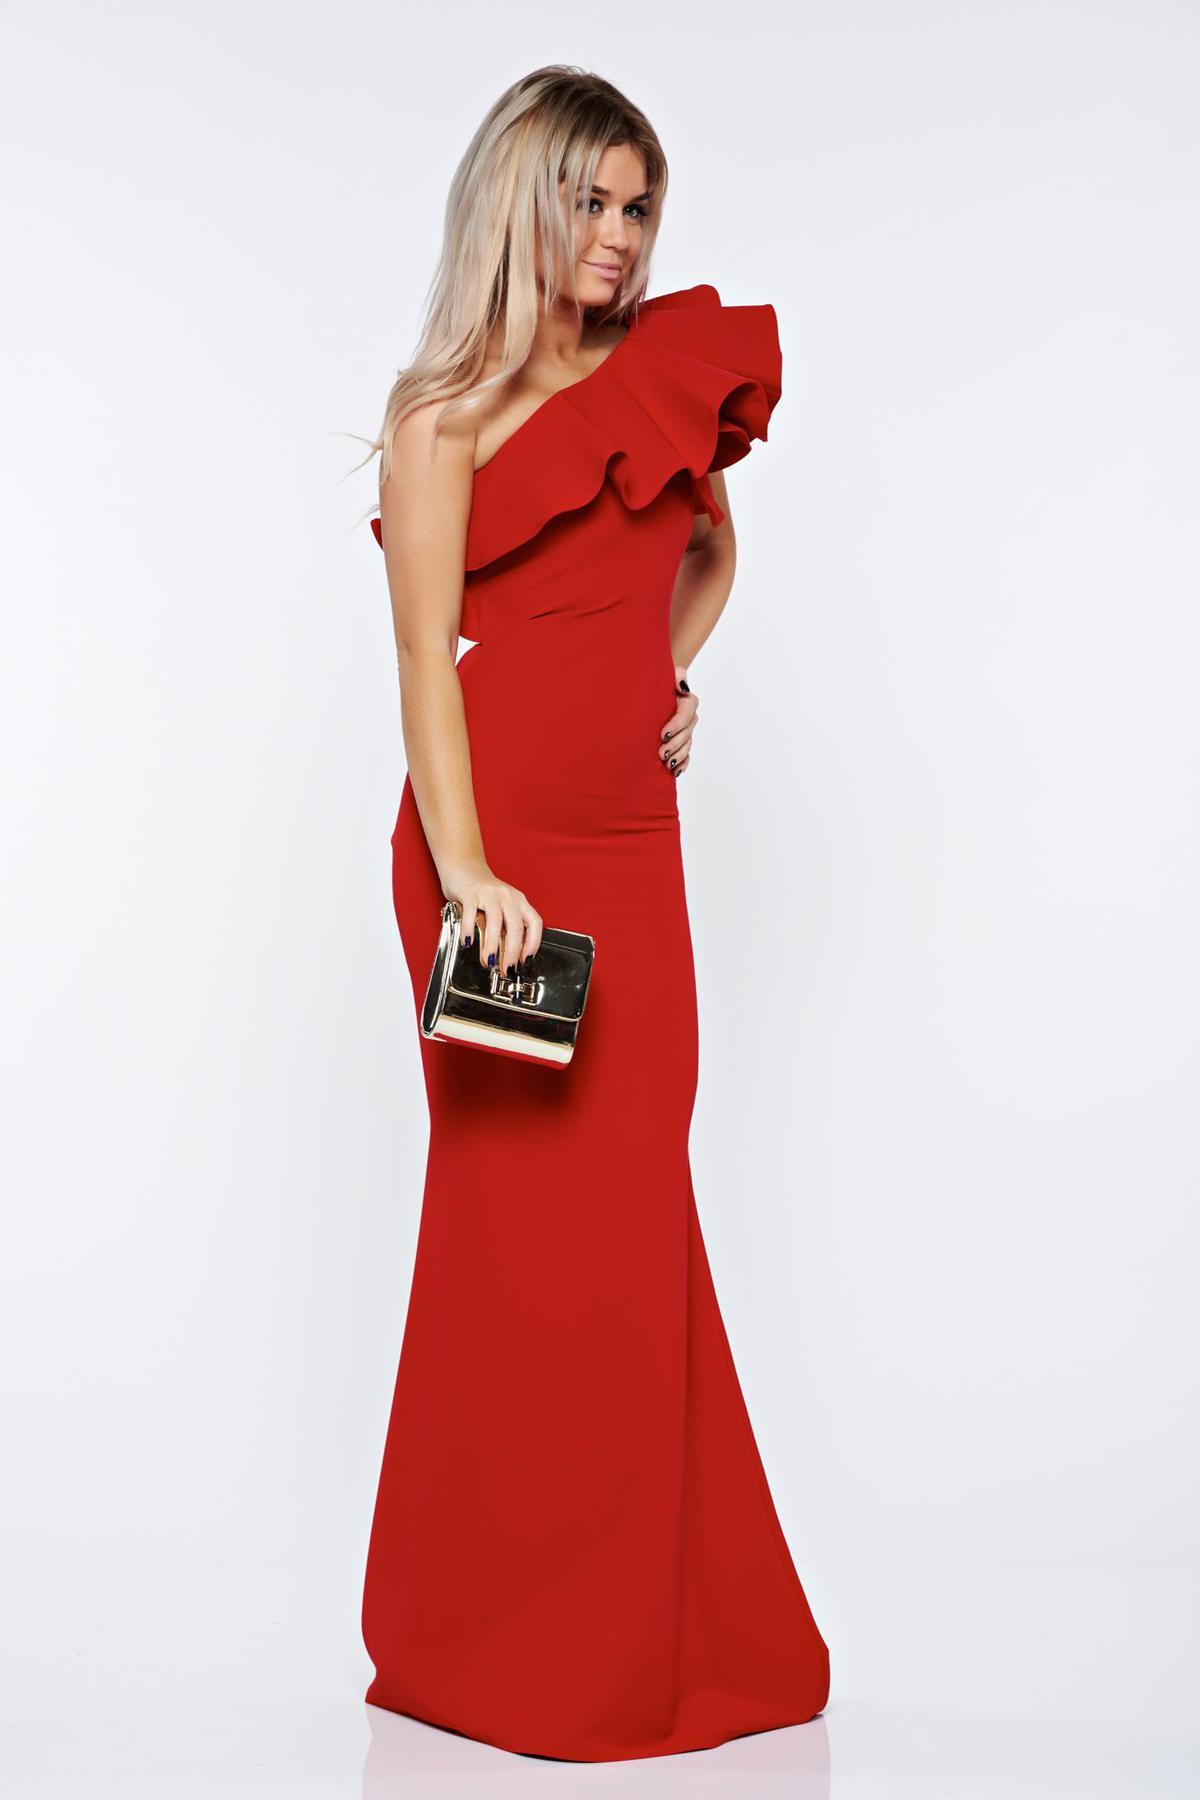 Rochie Ana Radu rosie de lux tip sirena pe umar din stofa usor elastica